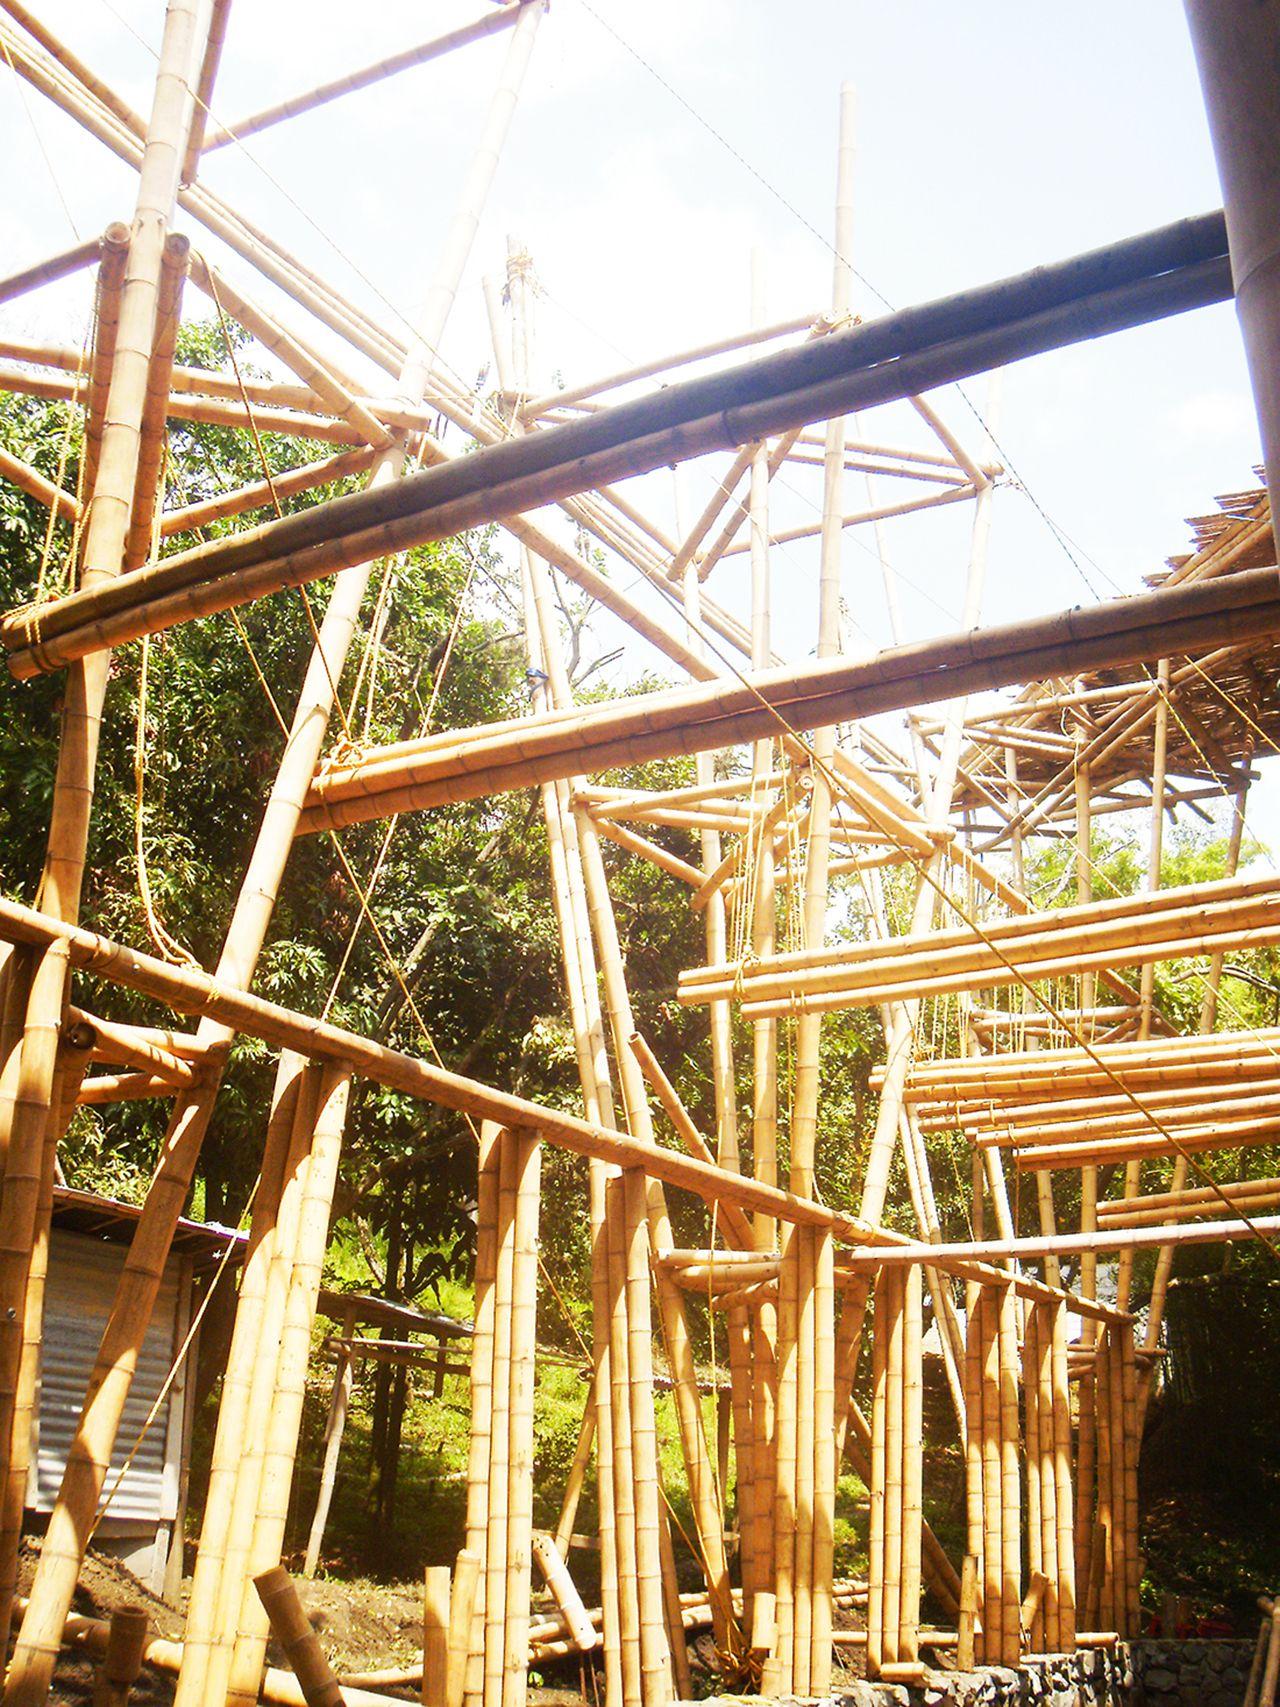 galer a de cali colombia escuela de bamb inicia campa a para finalizar su construcci n 33. Black Bedroom Furniture Sets. Home Design Ideas